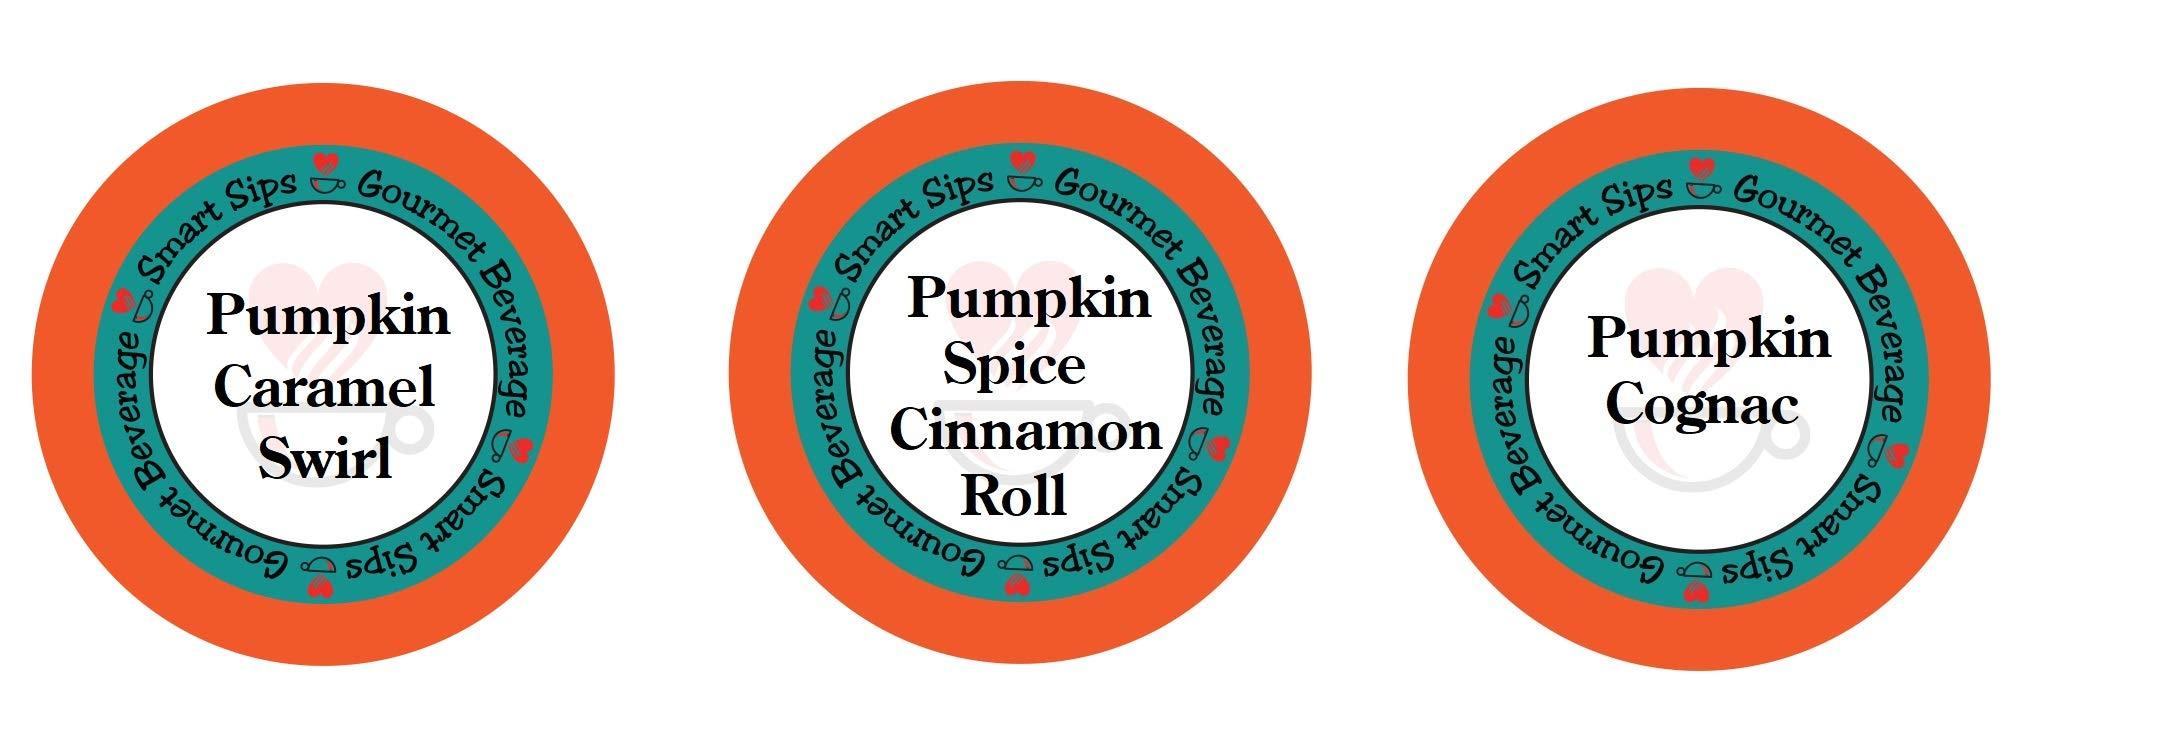 Smart Sips, Pumpkin Lovers Variety Sampler Pack- Pumpkin Spice Cinnamon Roll, Pumpkin Caramel Swirl, Pumpkin Cognac - for All Keurig K-cup Machines by Smart Sips Coffee